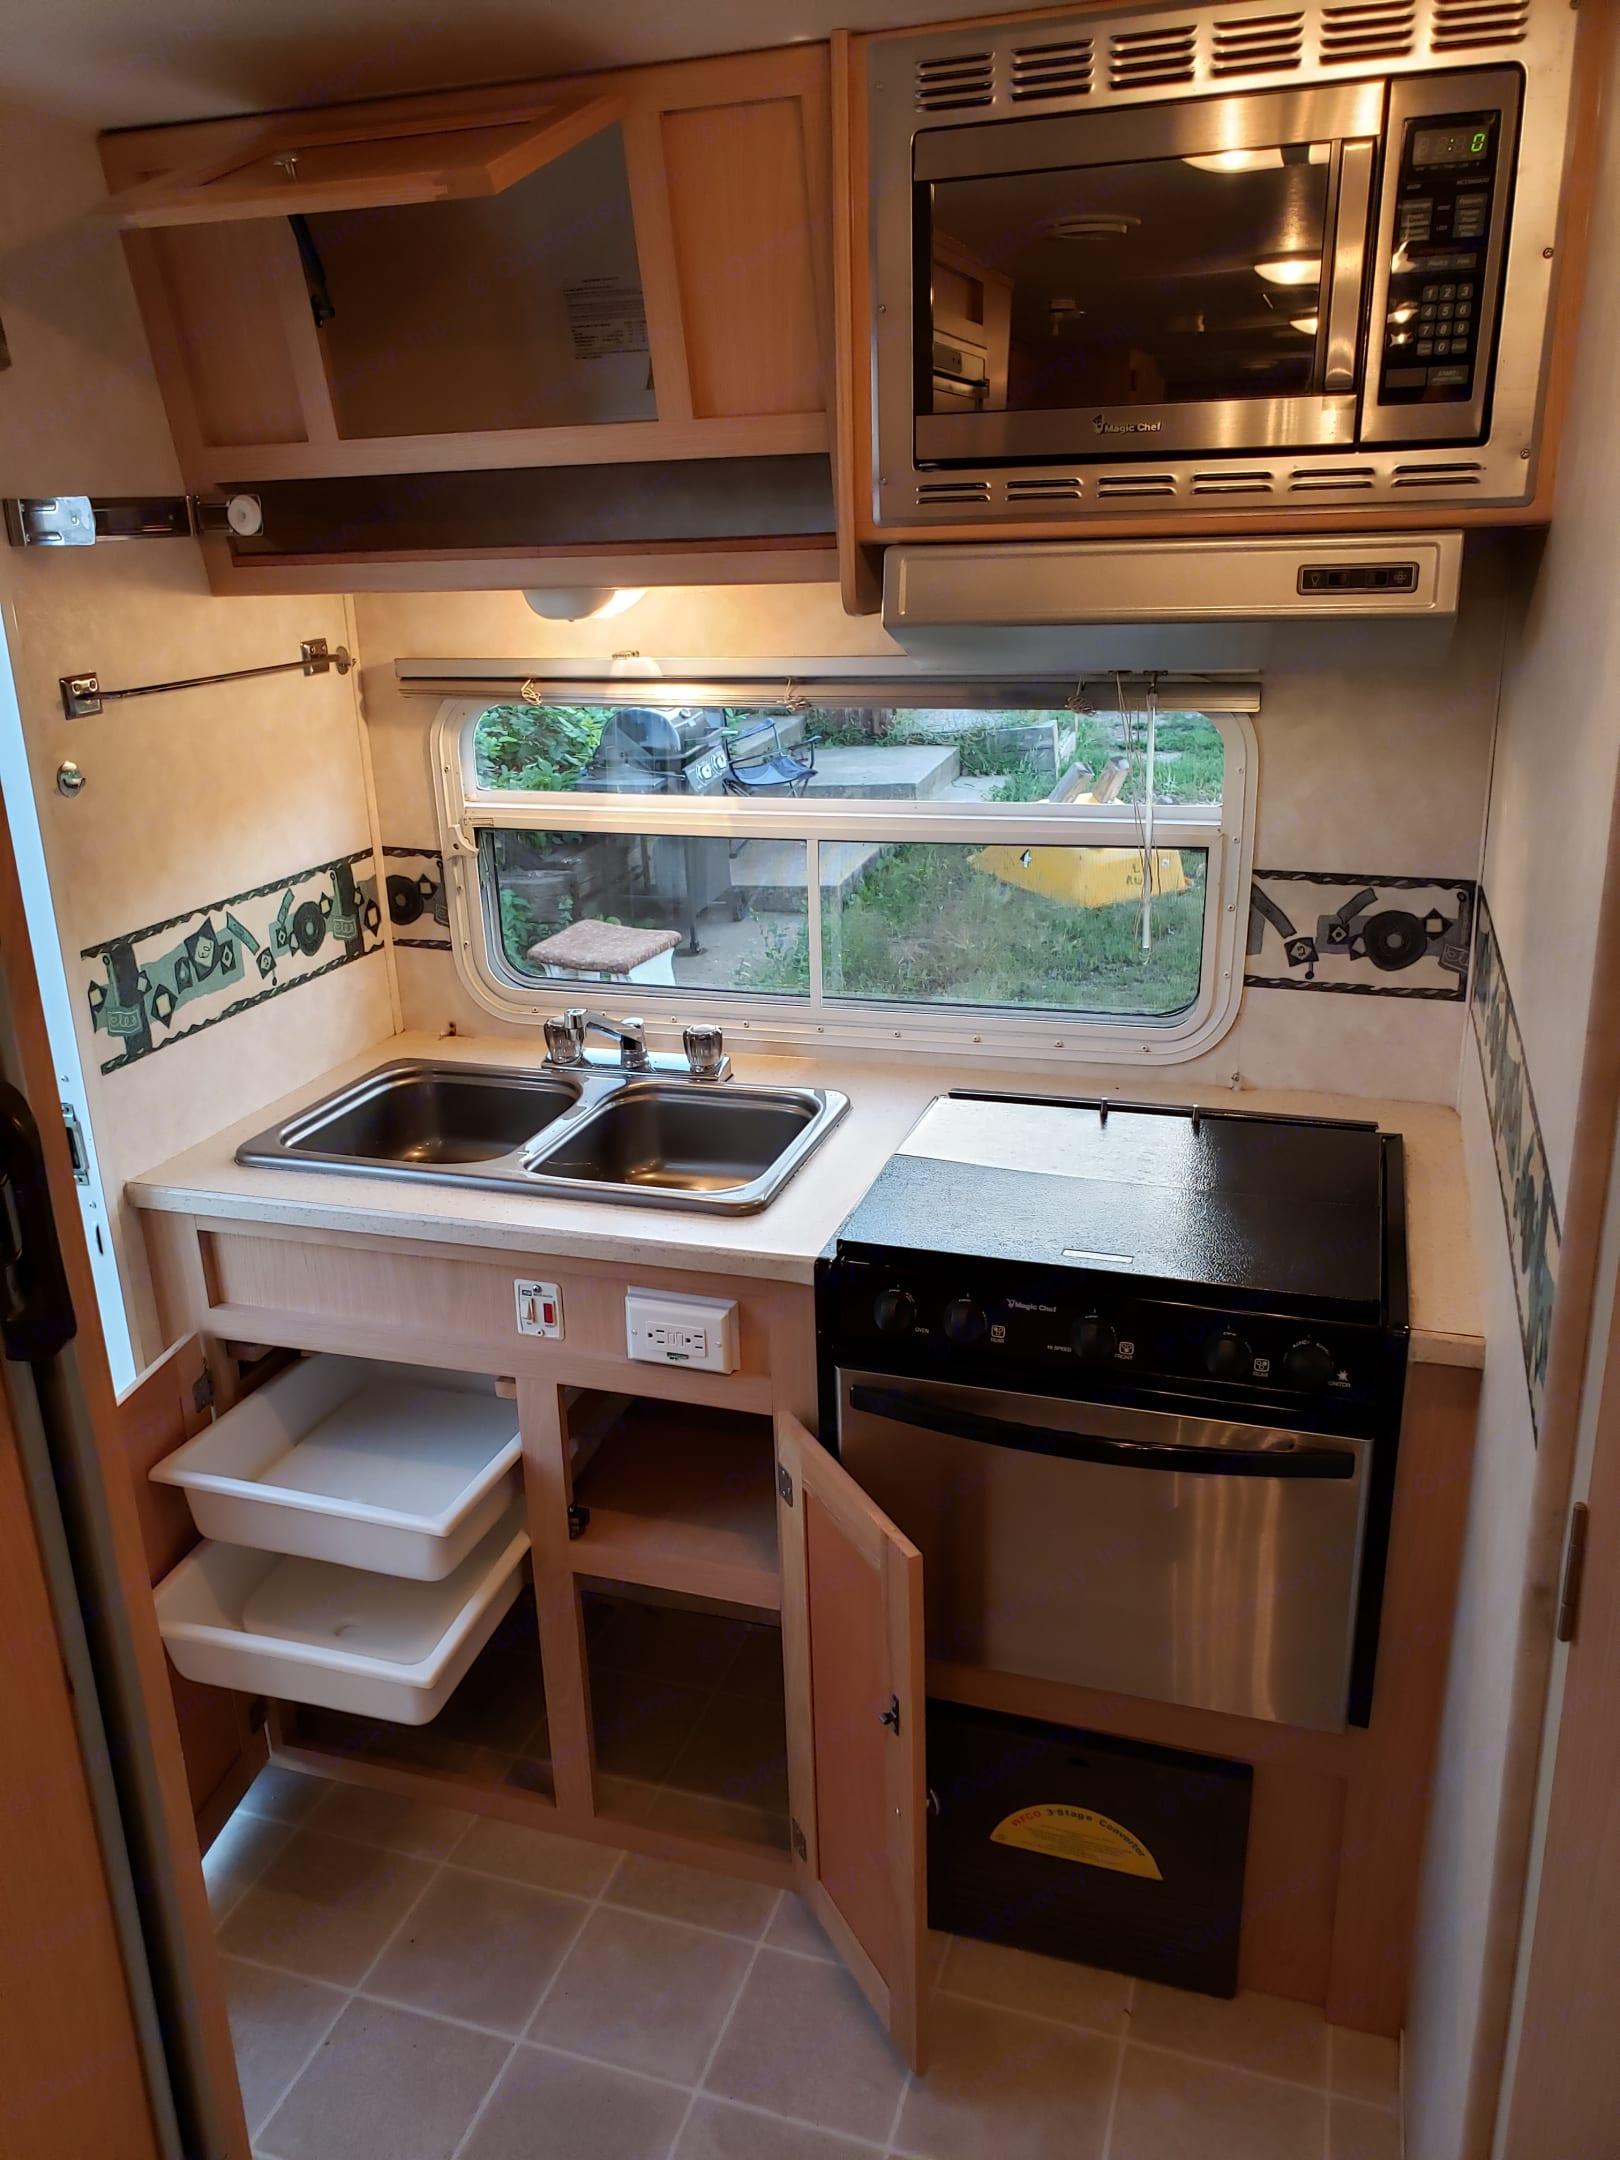 Kitchen w/ cabinets open. Forest River Surveyor 2006